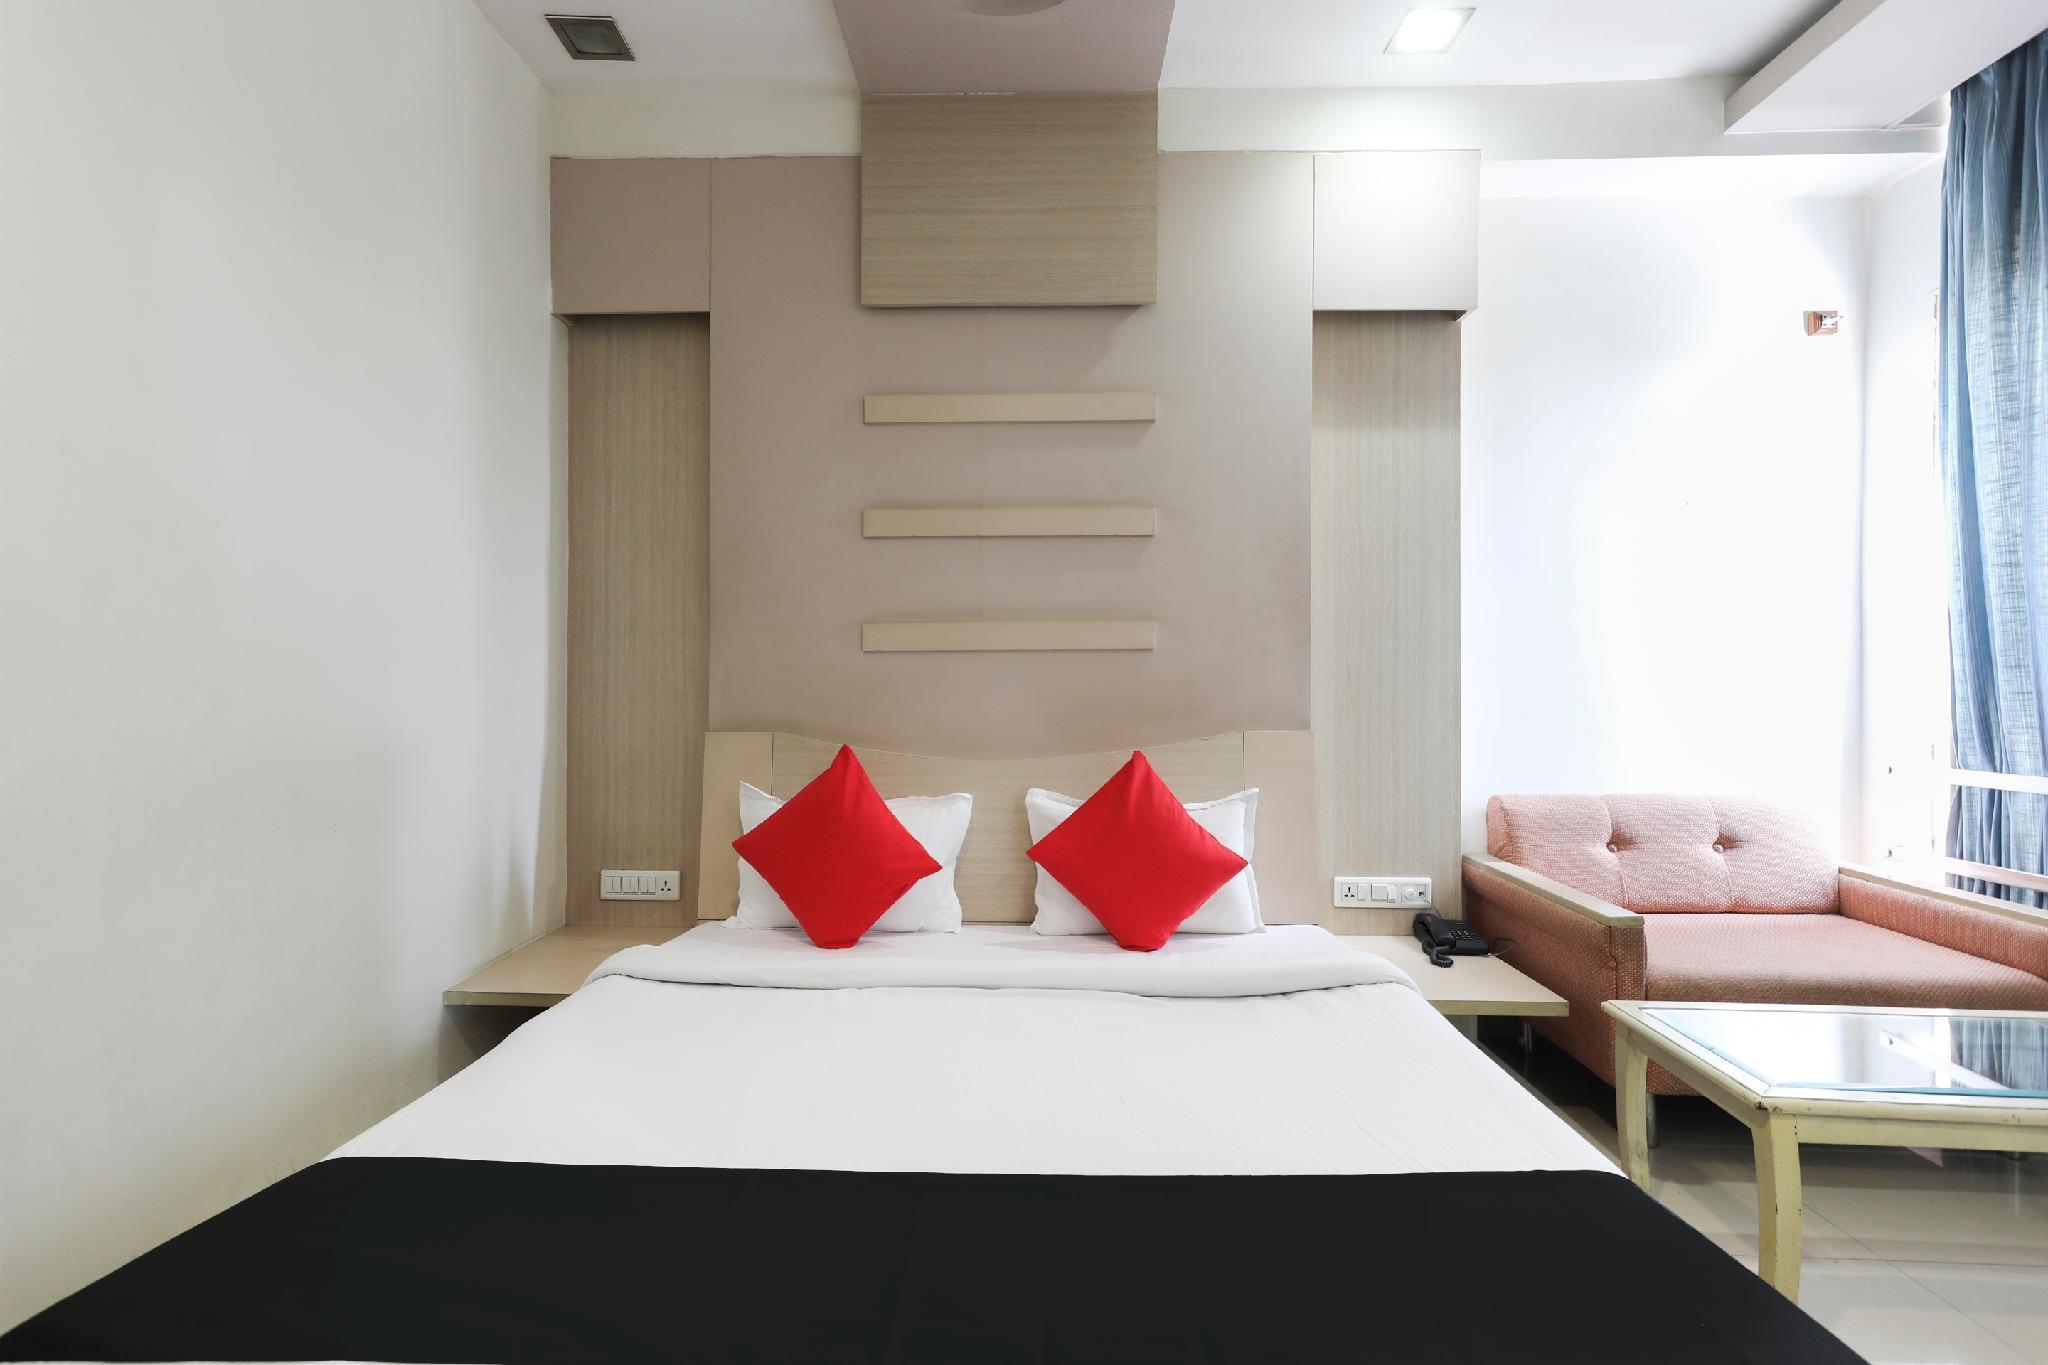 Capital O 62303 Hotel Apna Palace